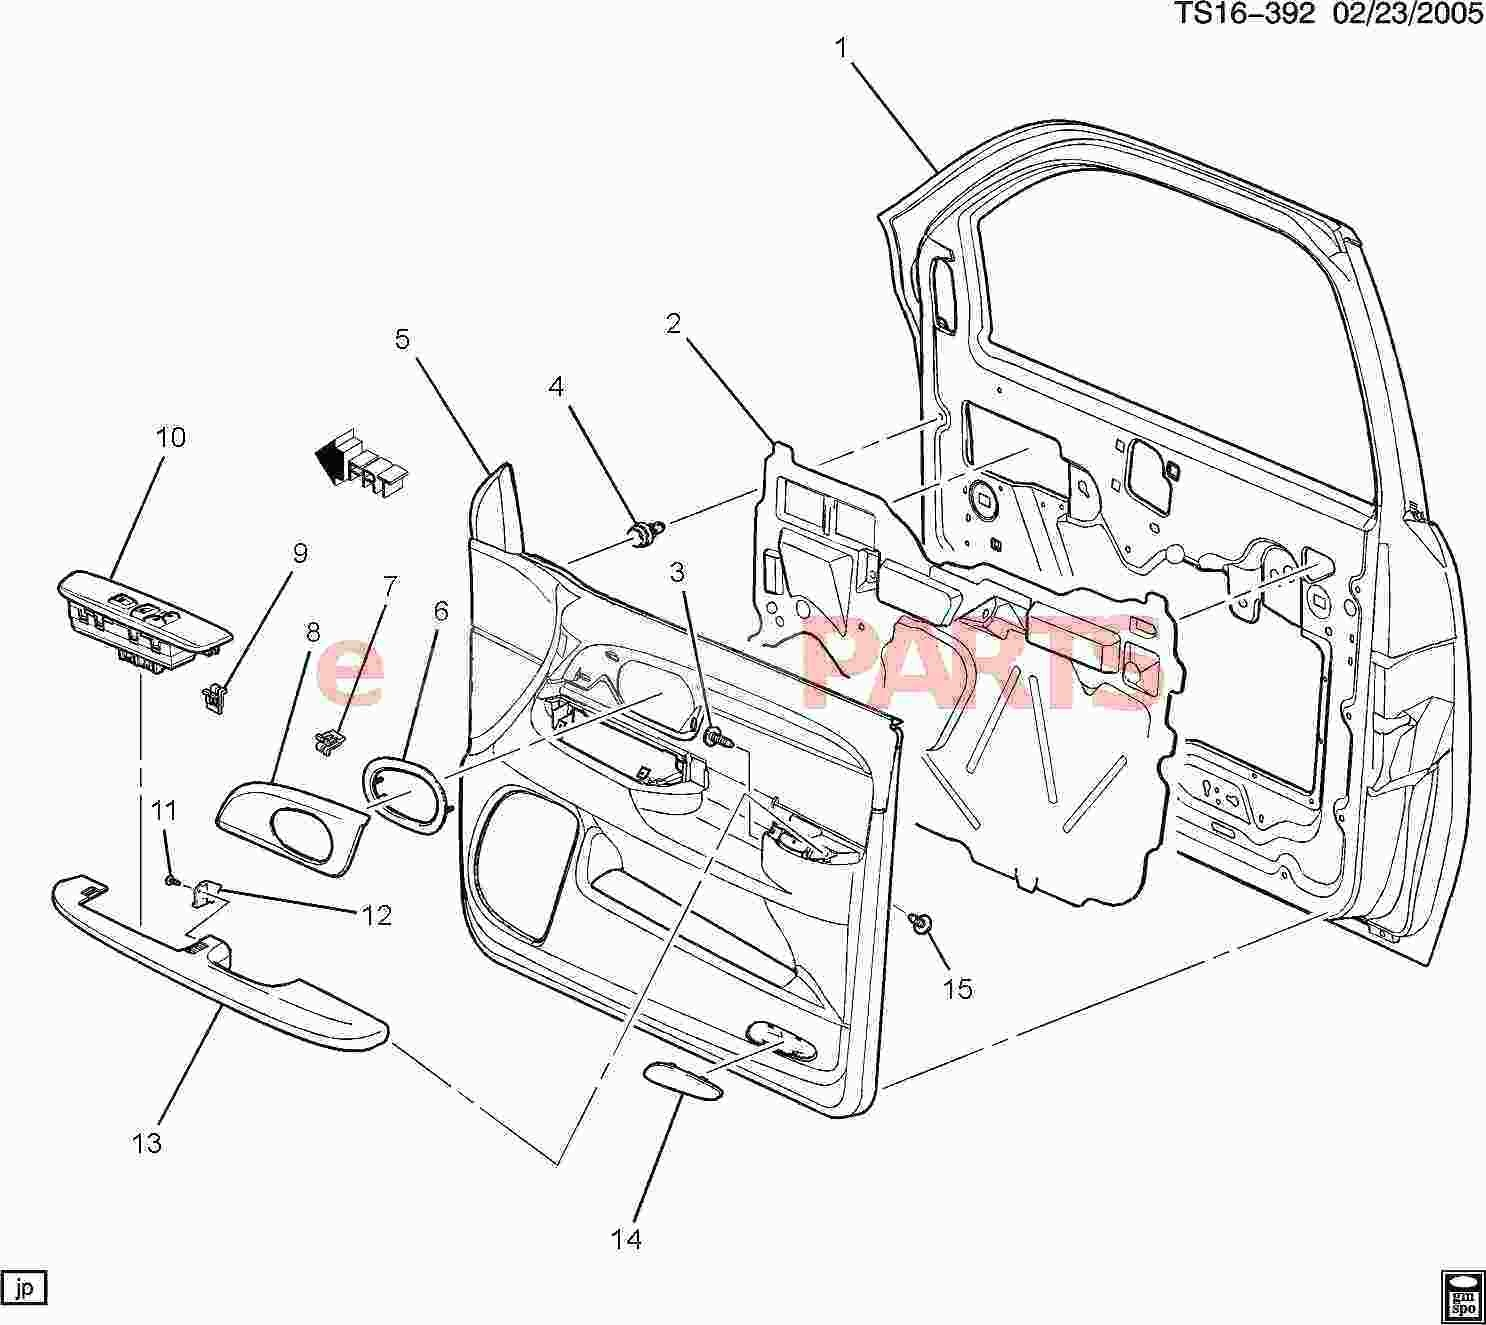 Names Of Car Parts Diagram Car Diagram Marvelous Car Parts Diagram Car Parts Diagrams Line Of Names Of Car Parts Diagram